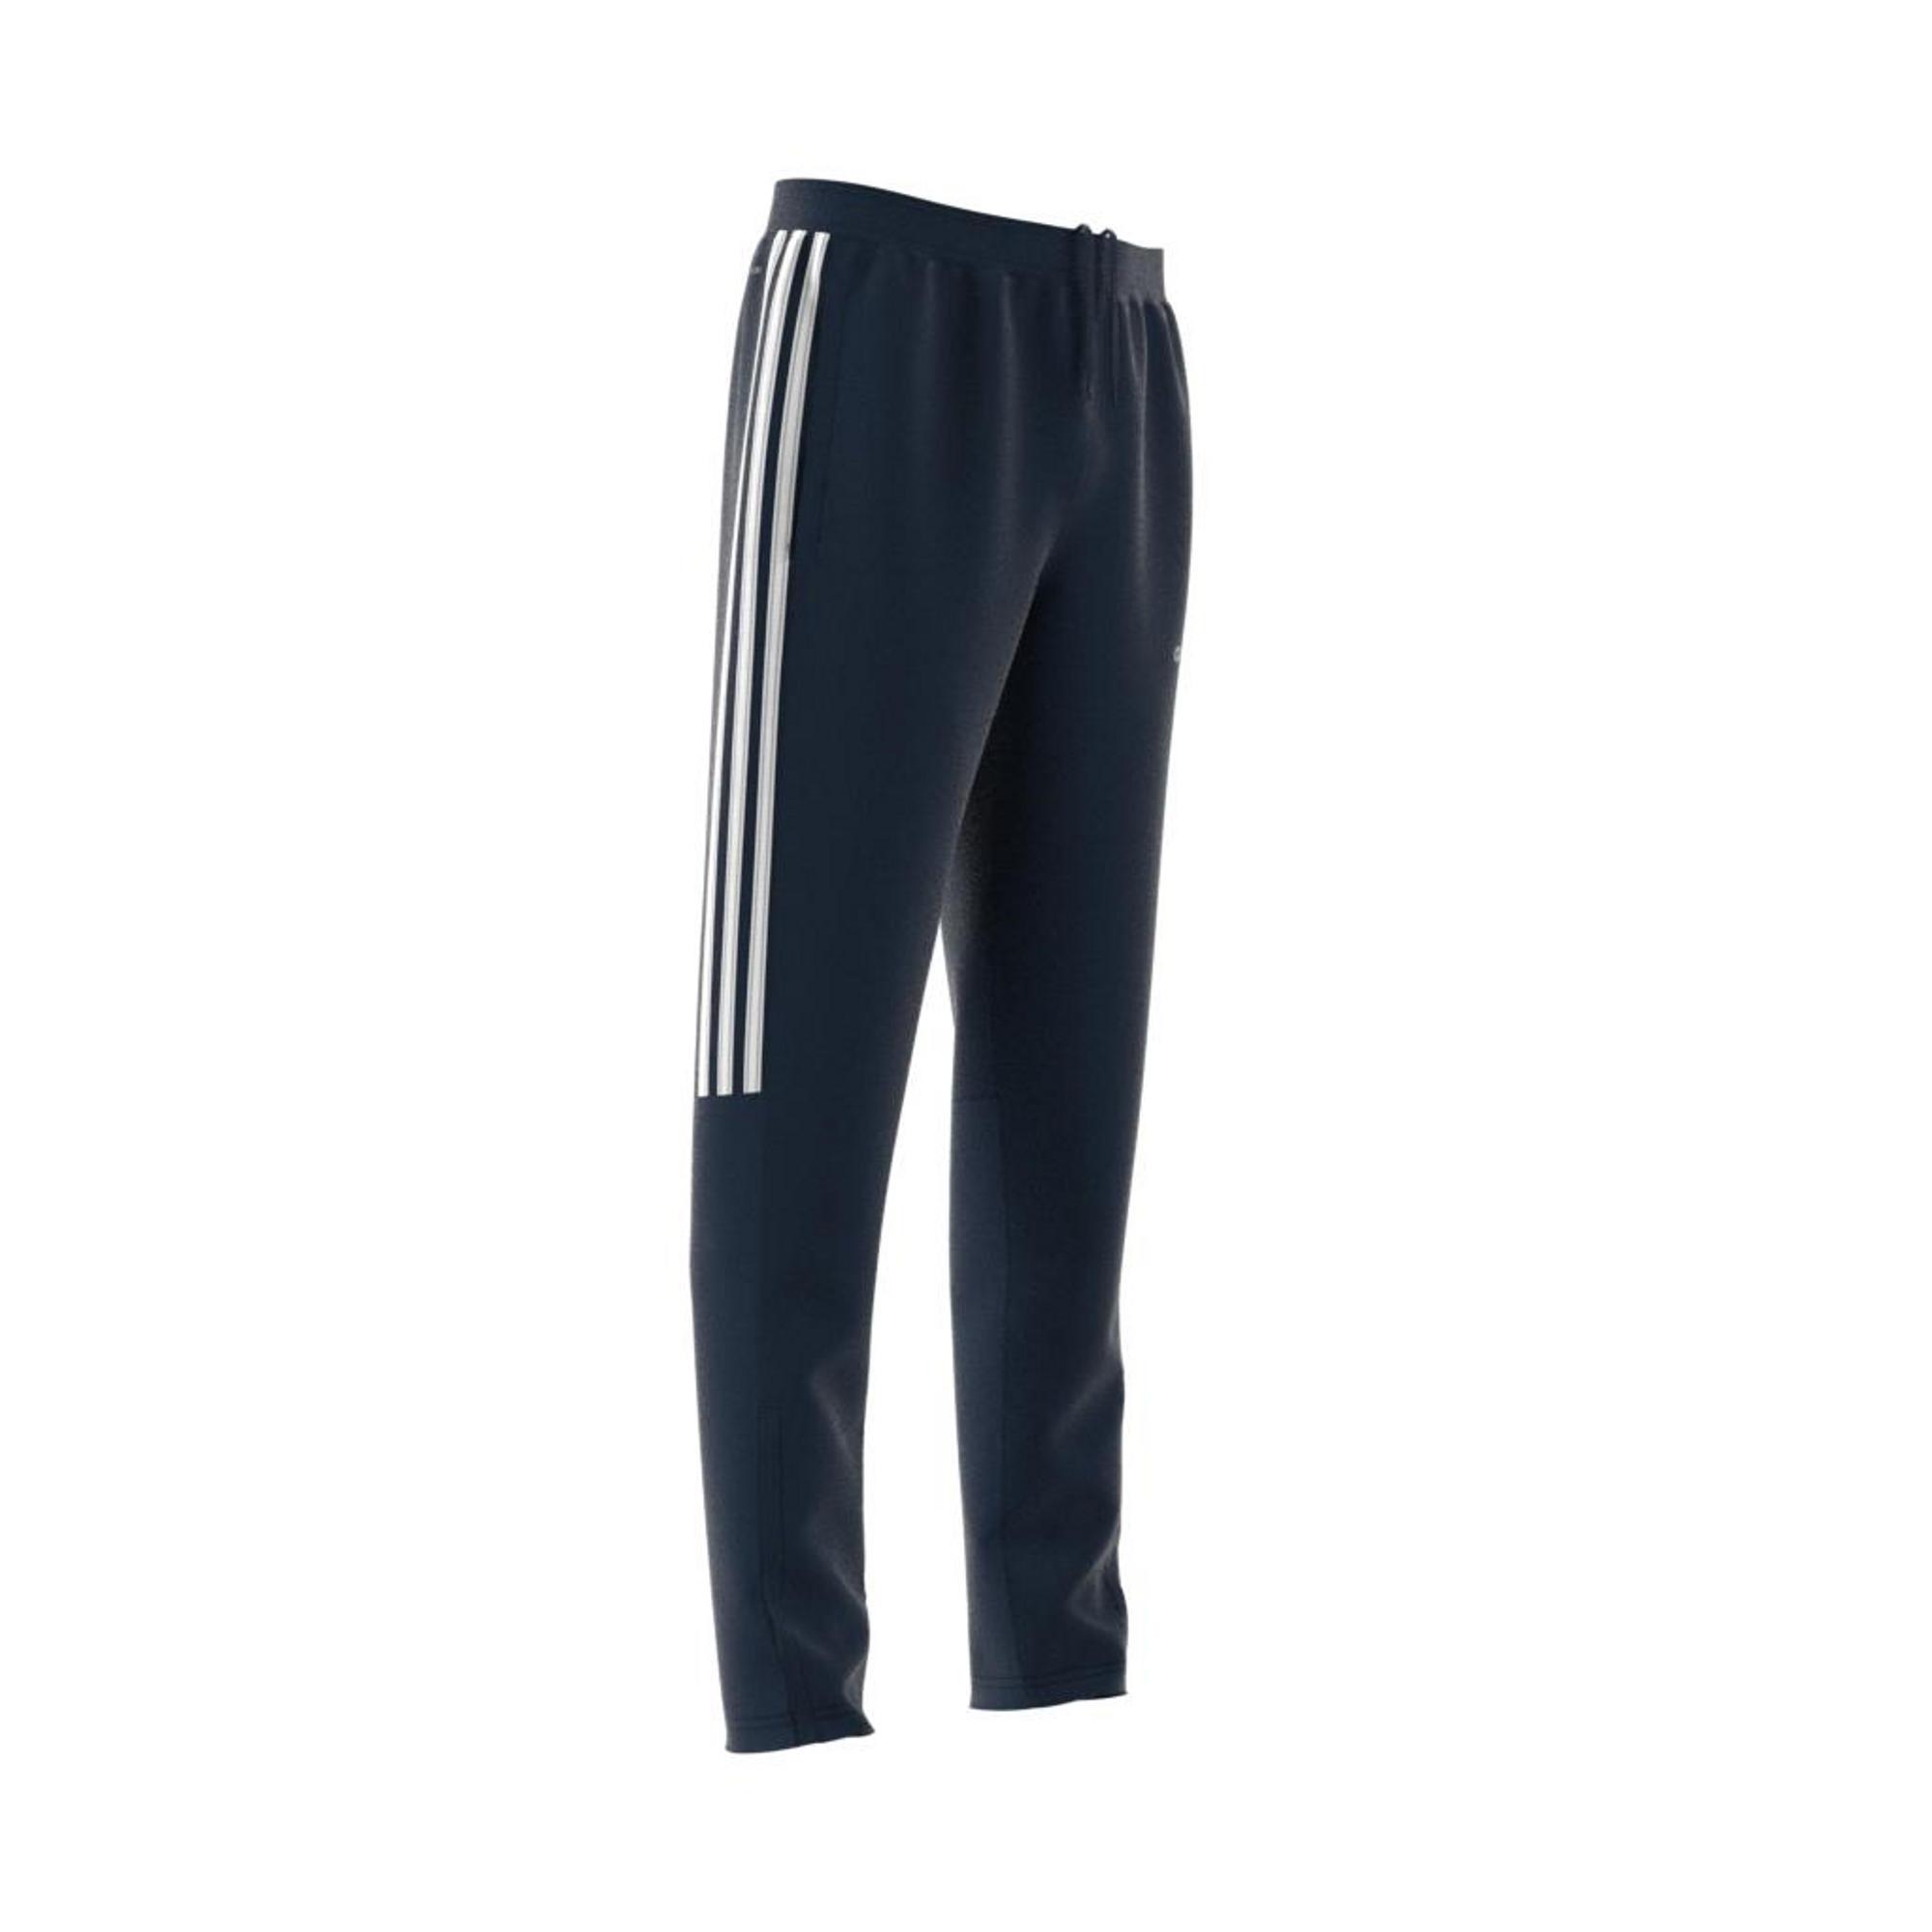 Pantalon Adidas Băieţi